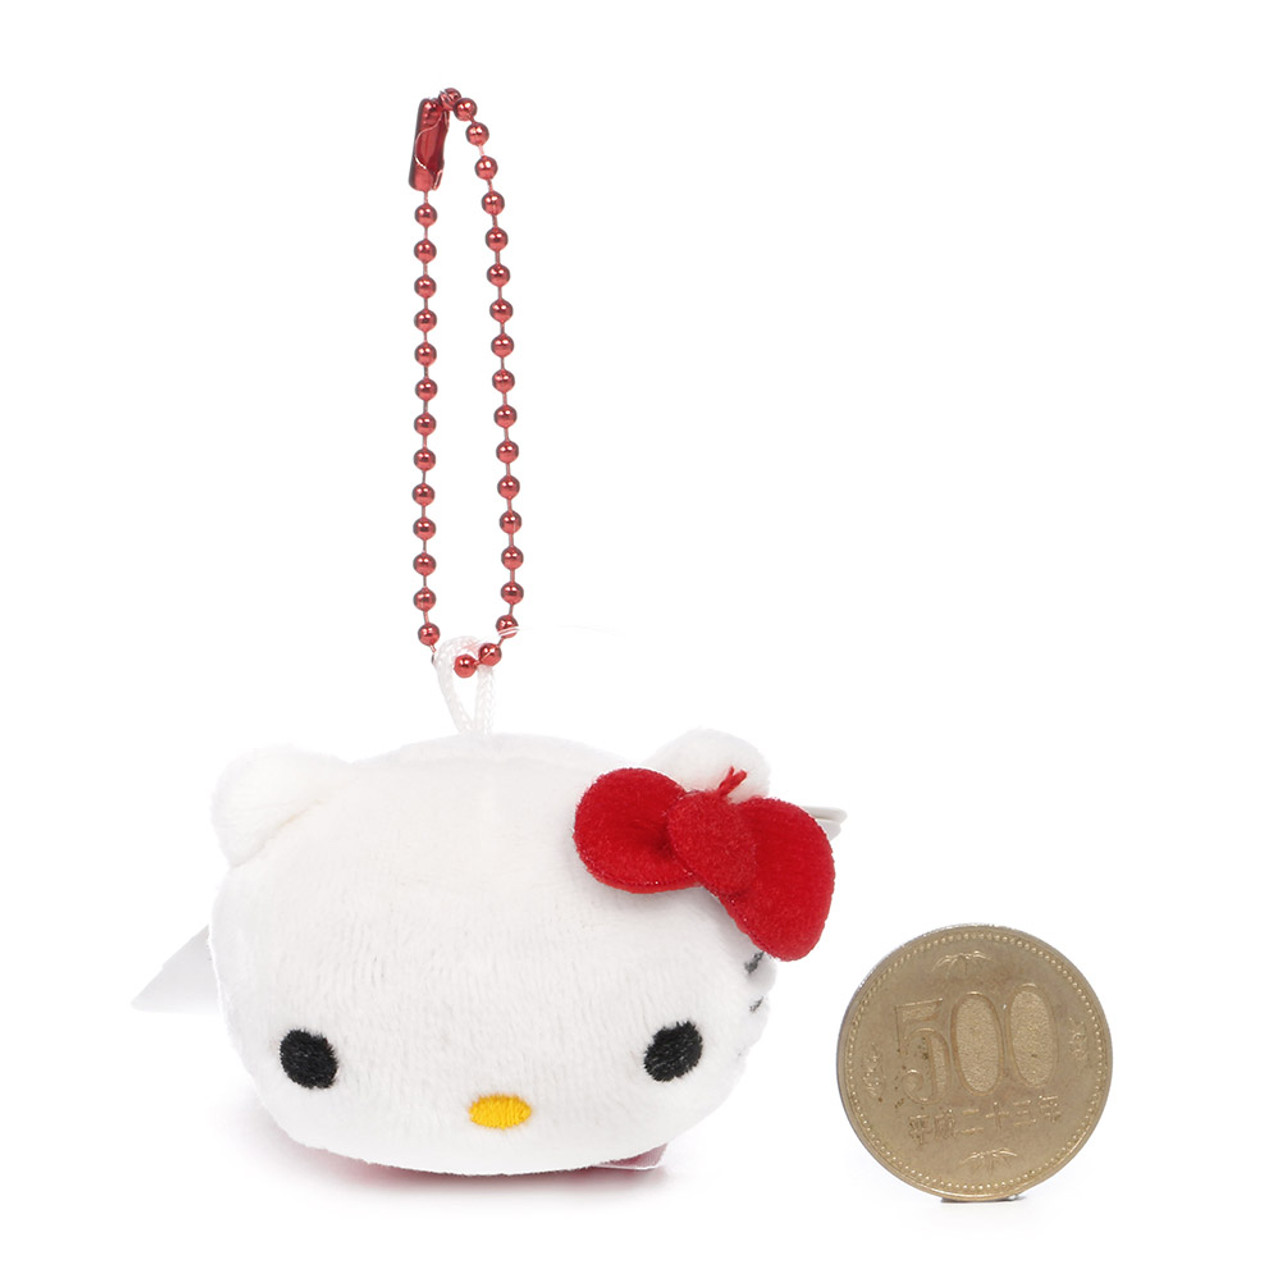 Sanrio x Monimals Hello Kitty Cute Animal Mascot Plush Keychain ( Proportion )